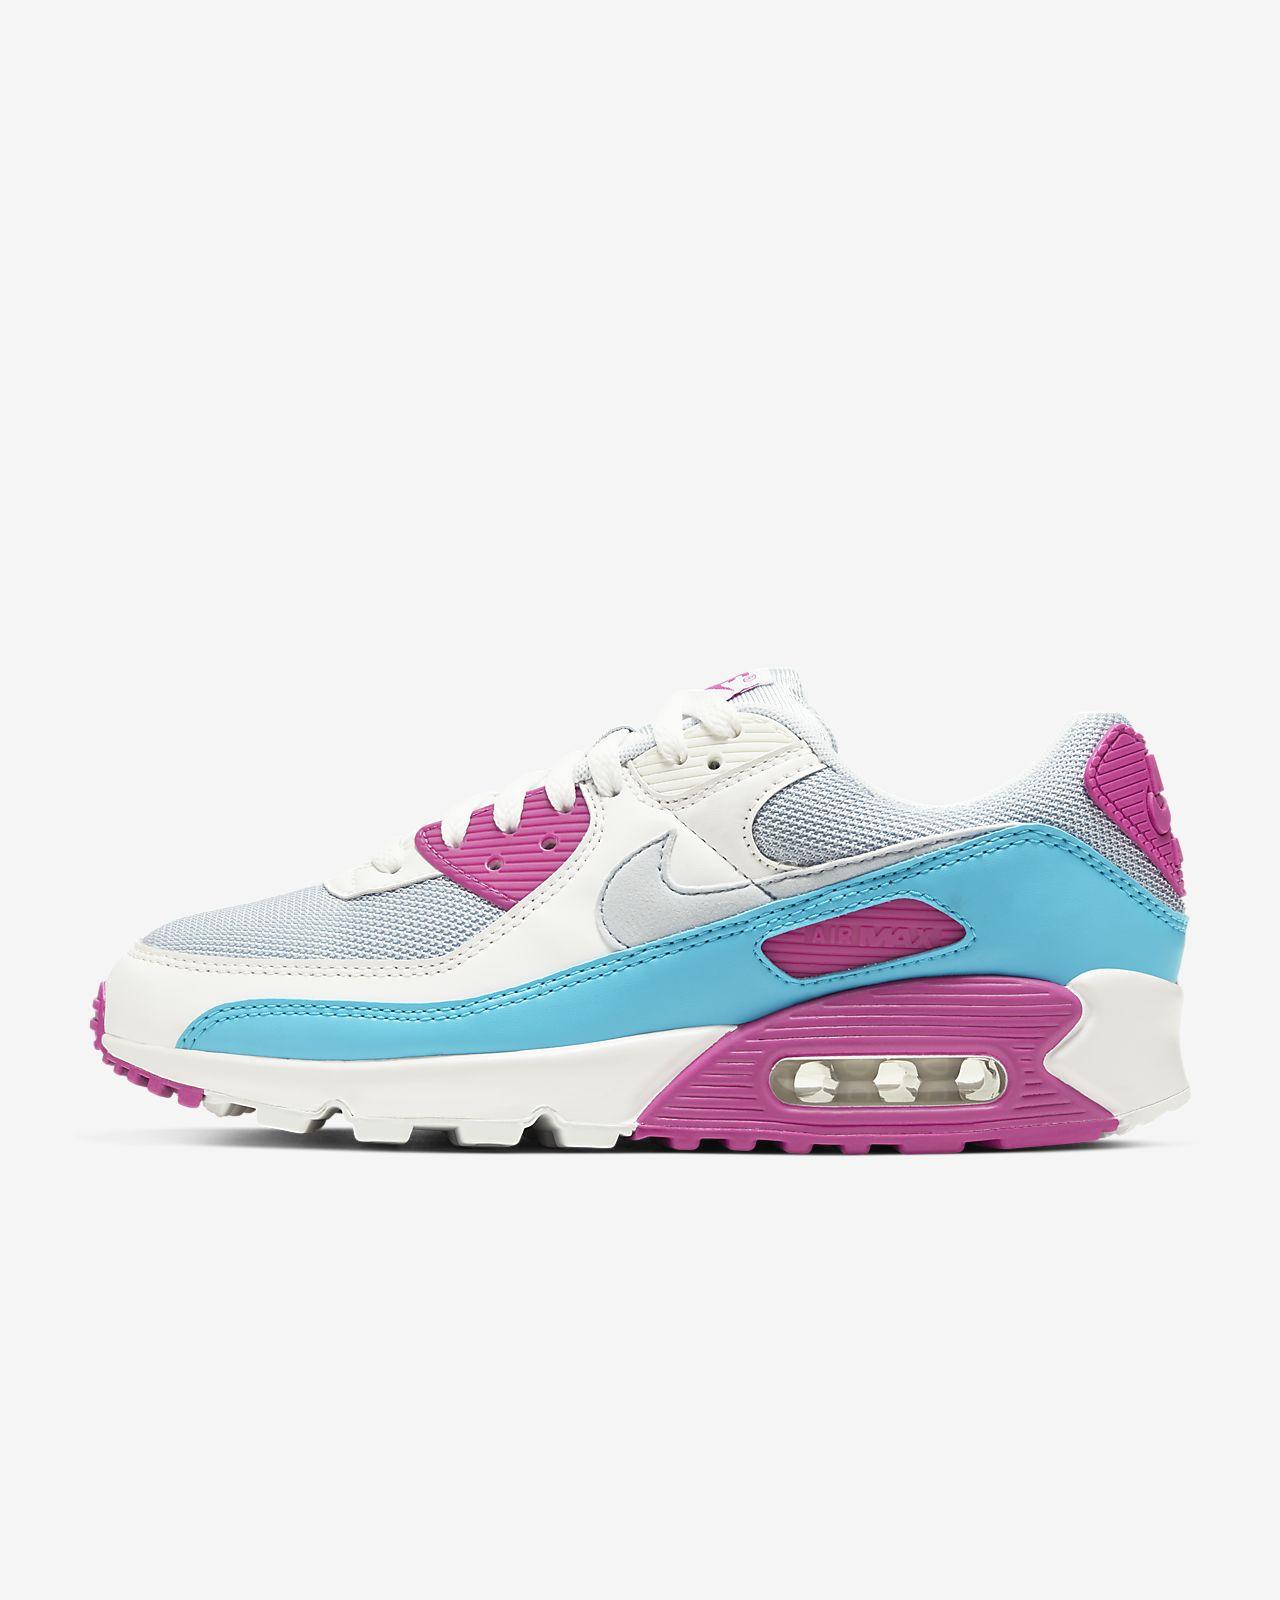 The Nike Air Max 90 Premium Women's Shoe.